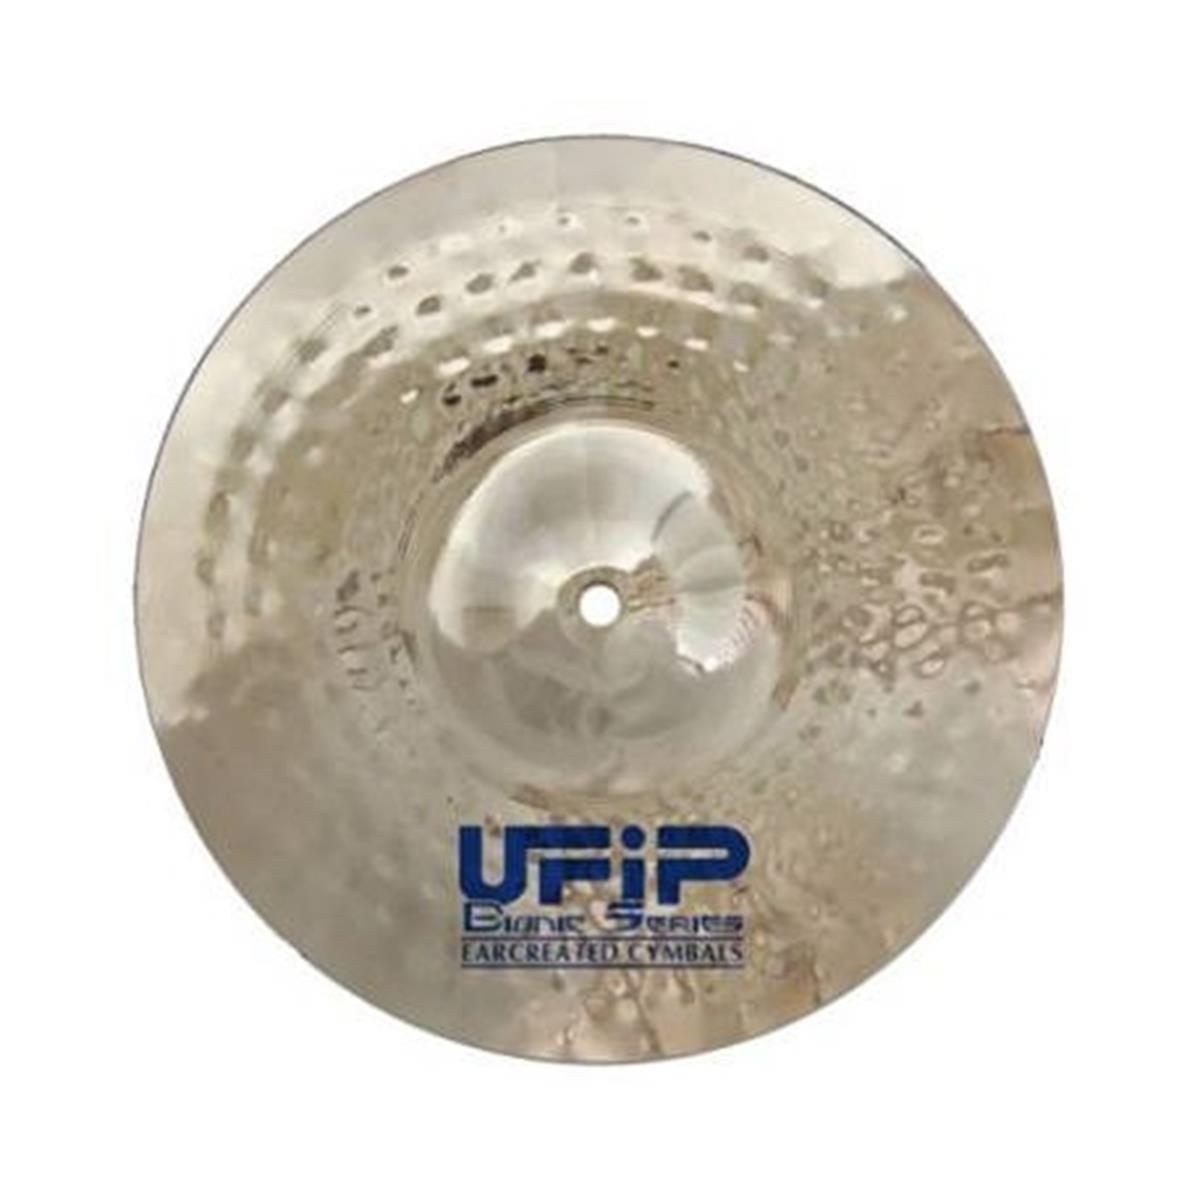 UFIP BIONIC SPLASH 12